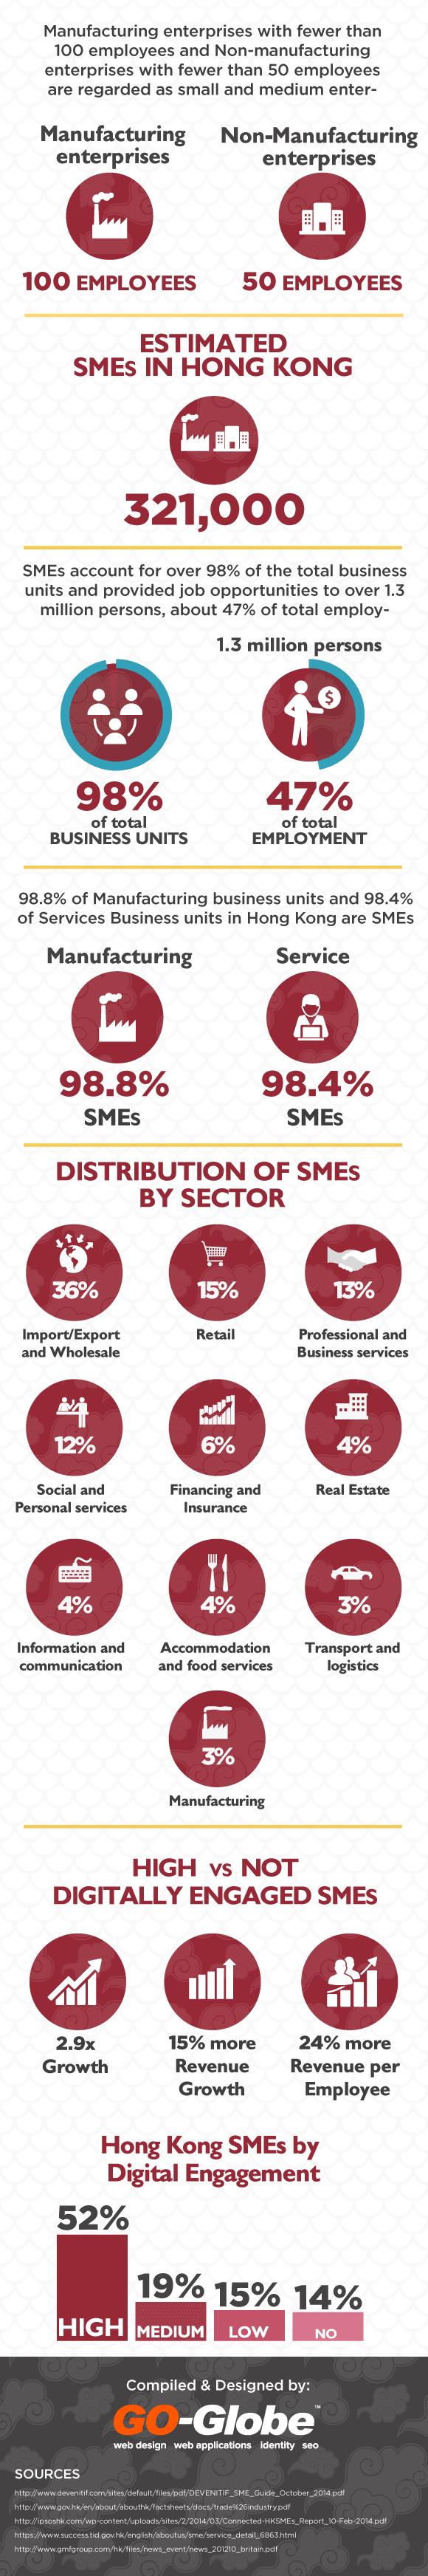 hk-sme-enterprises-statistics&trends2